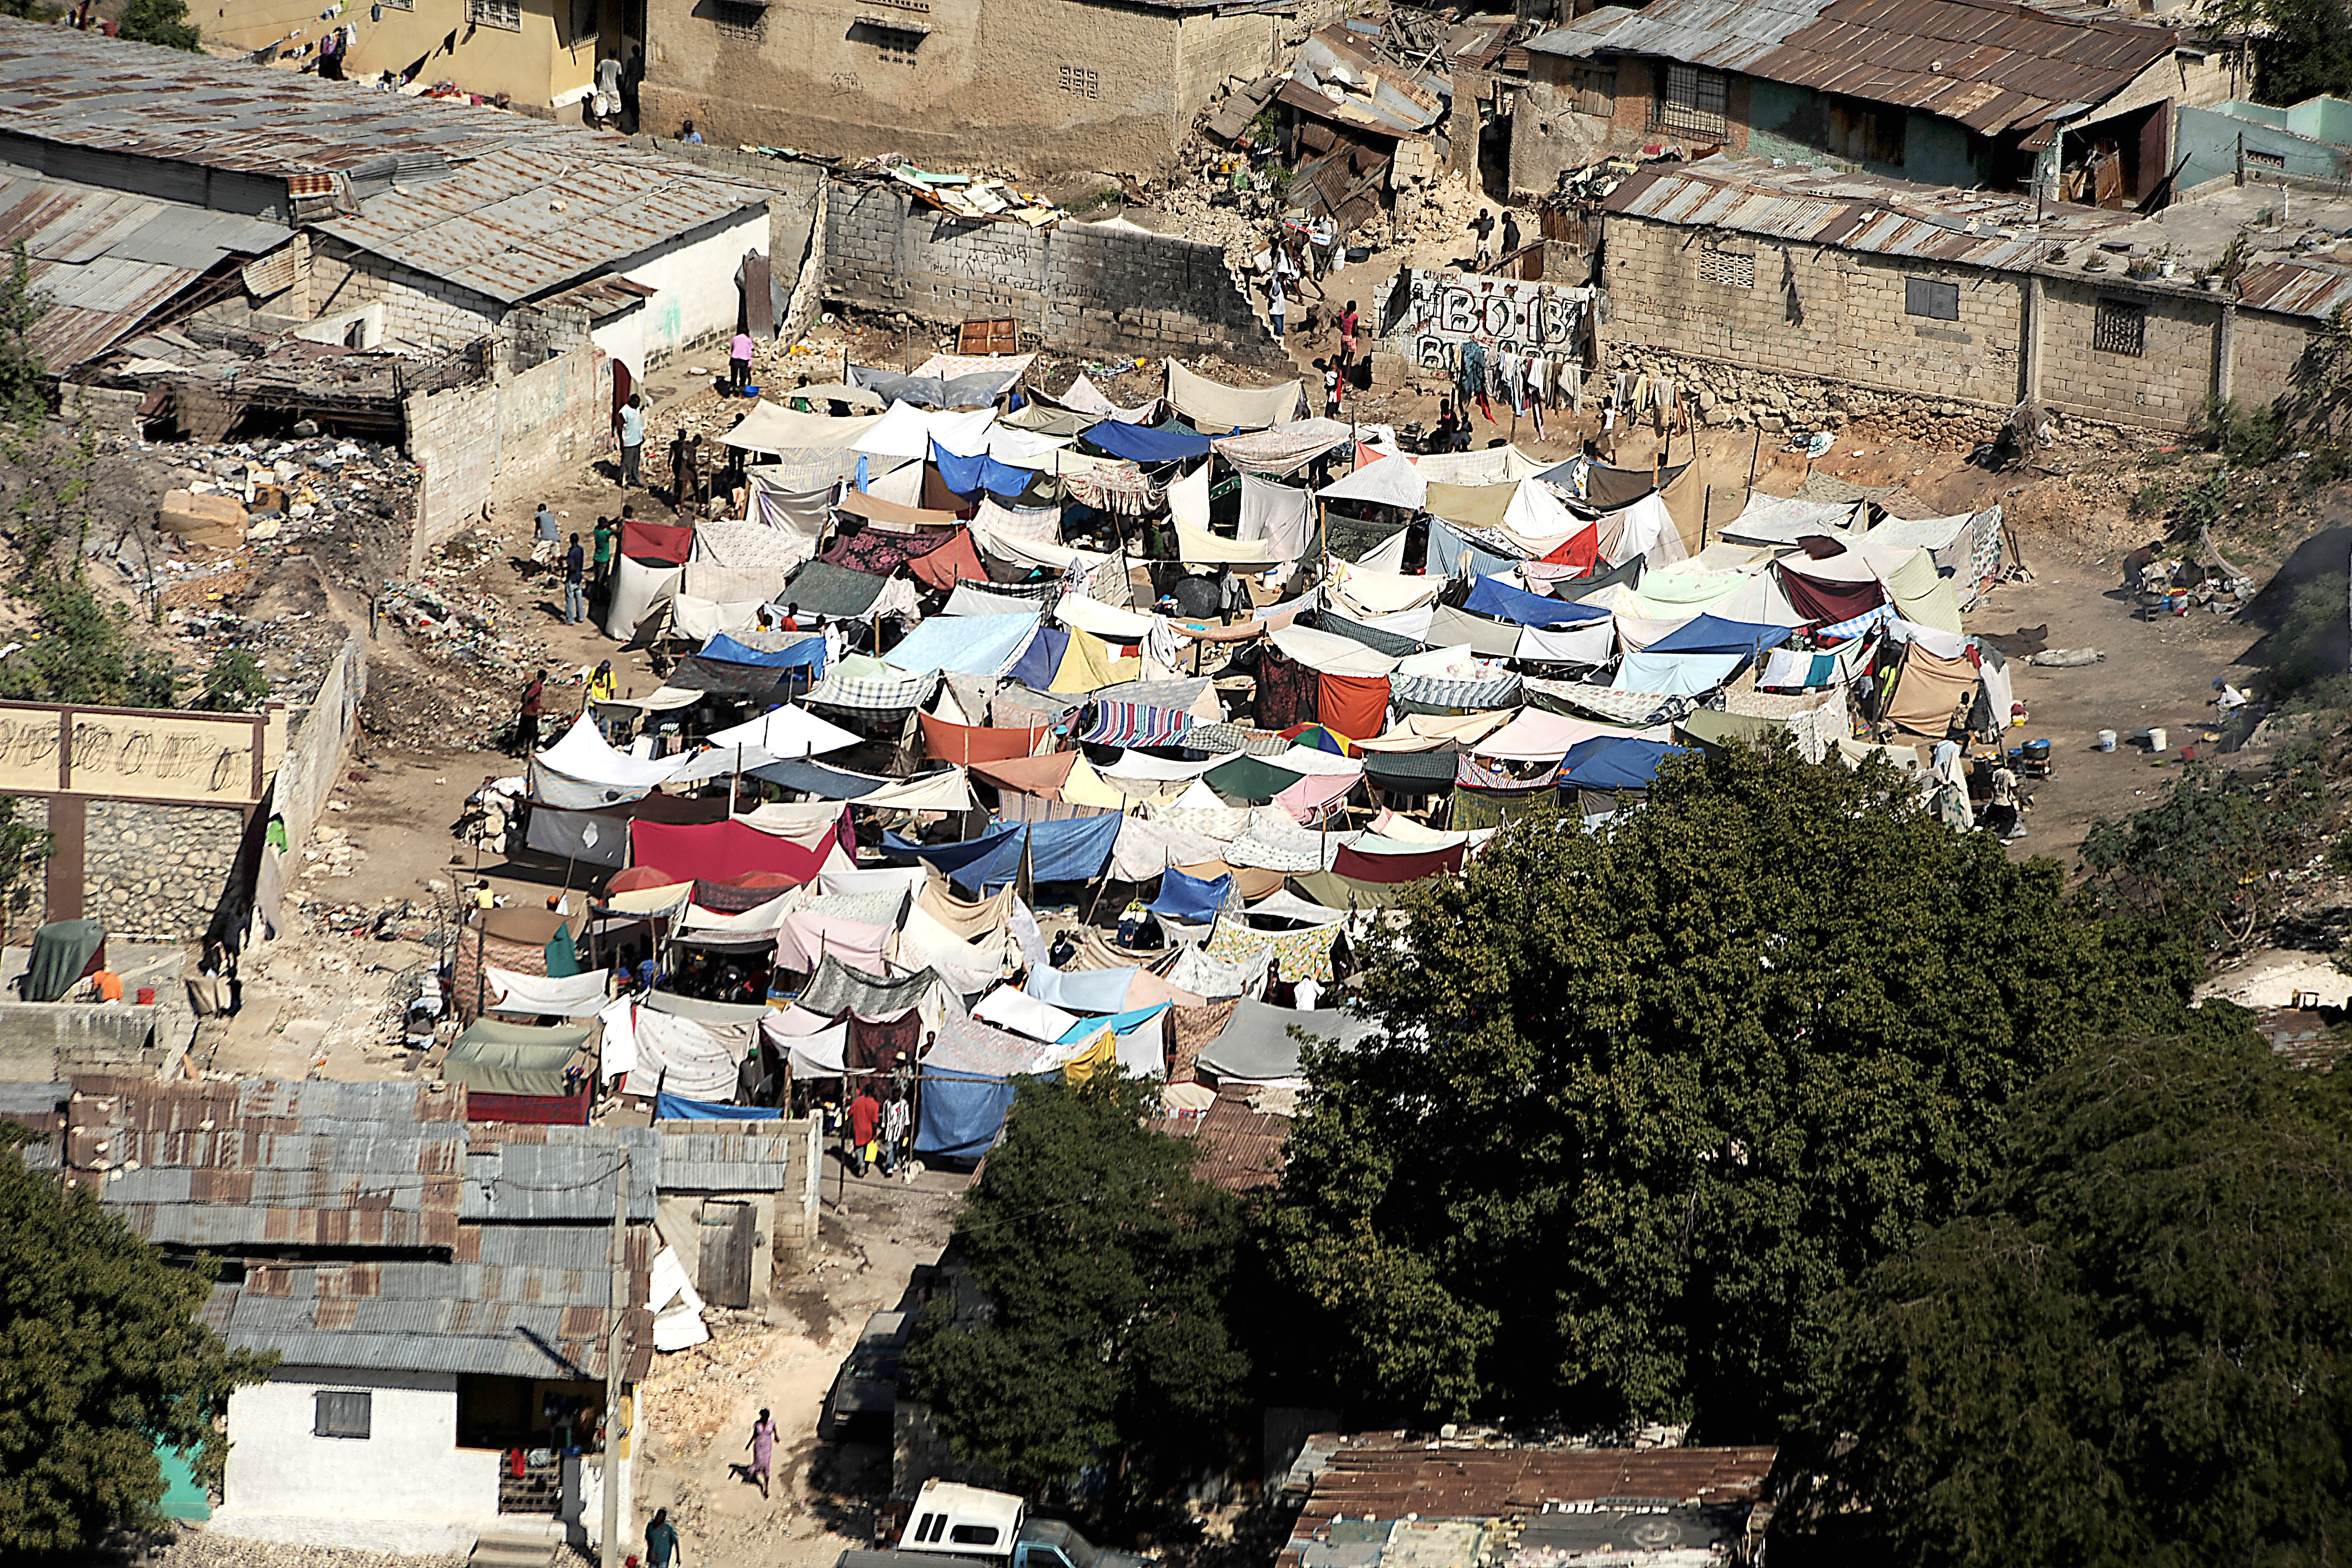 file earthquake damage in downtown port au prince jpg file earthquake damage in downtown port au prince 2010 01 16